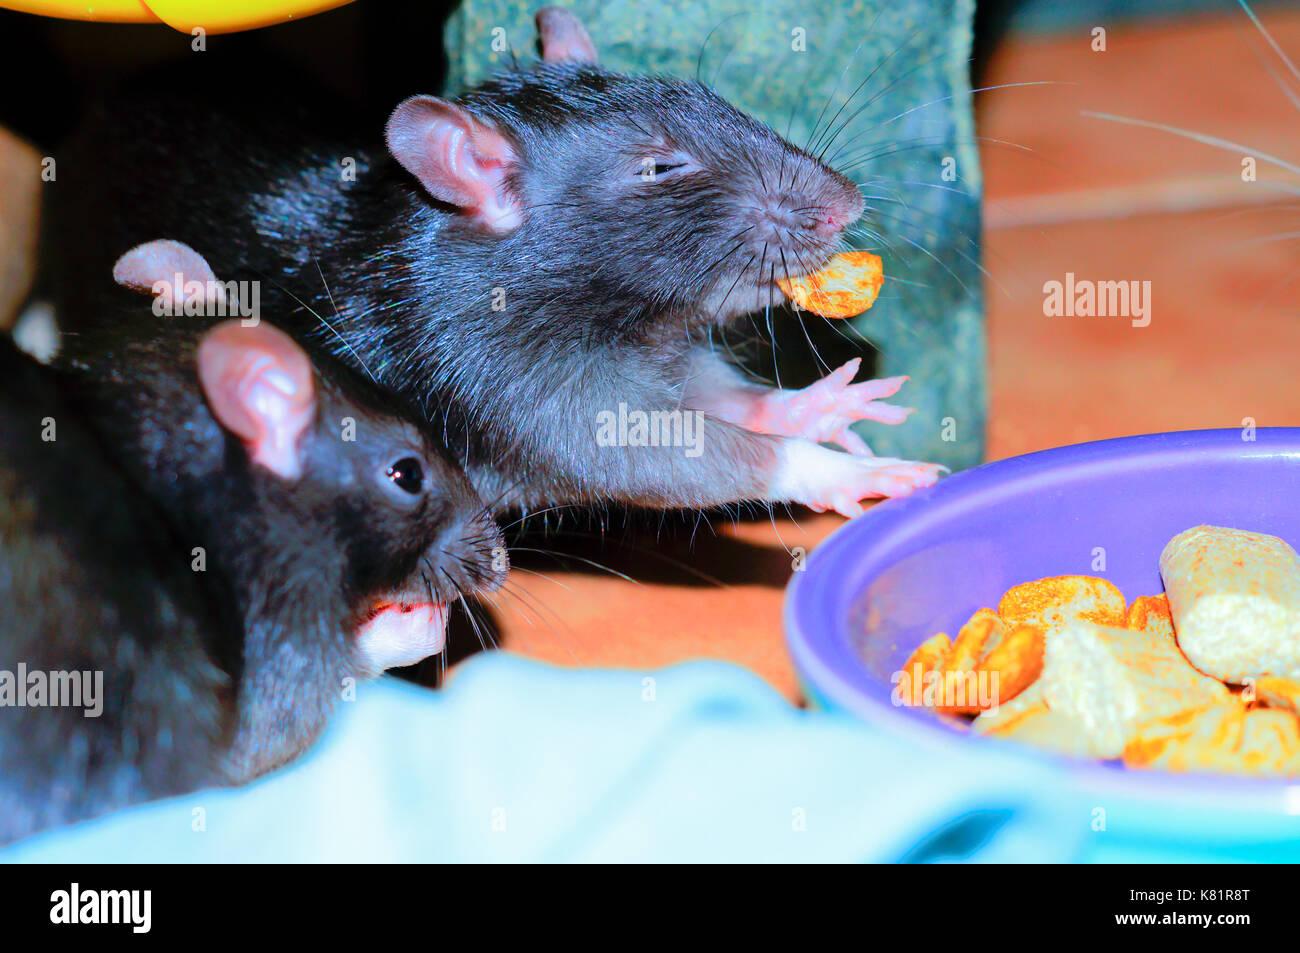 Zwei Ratten essen Lebensmittel Stockbild